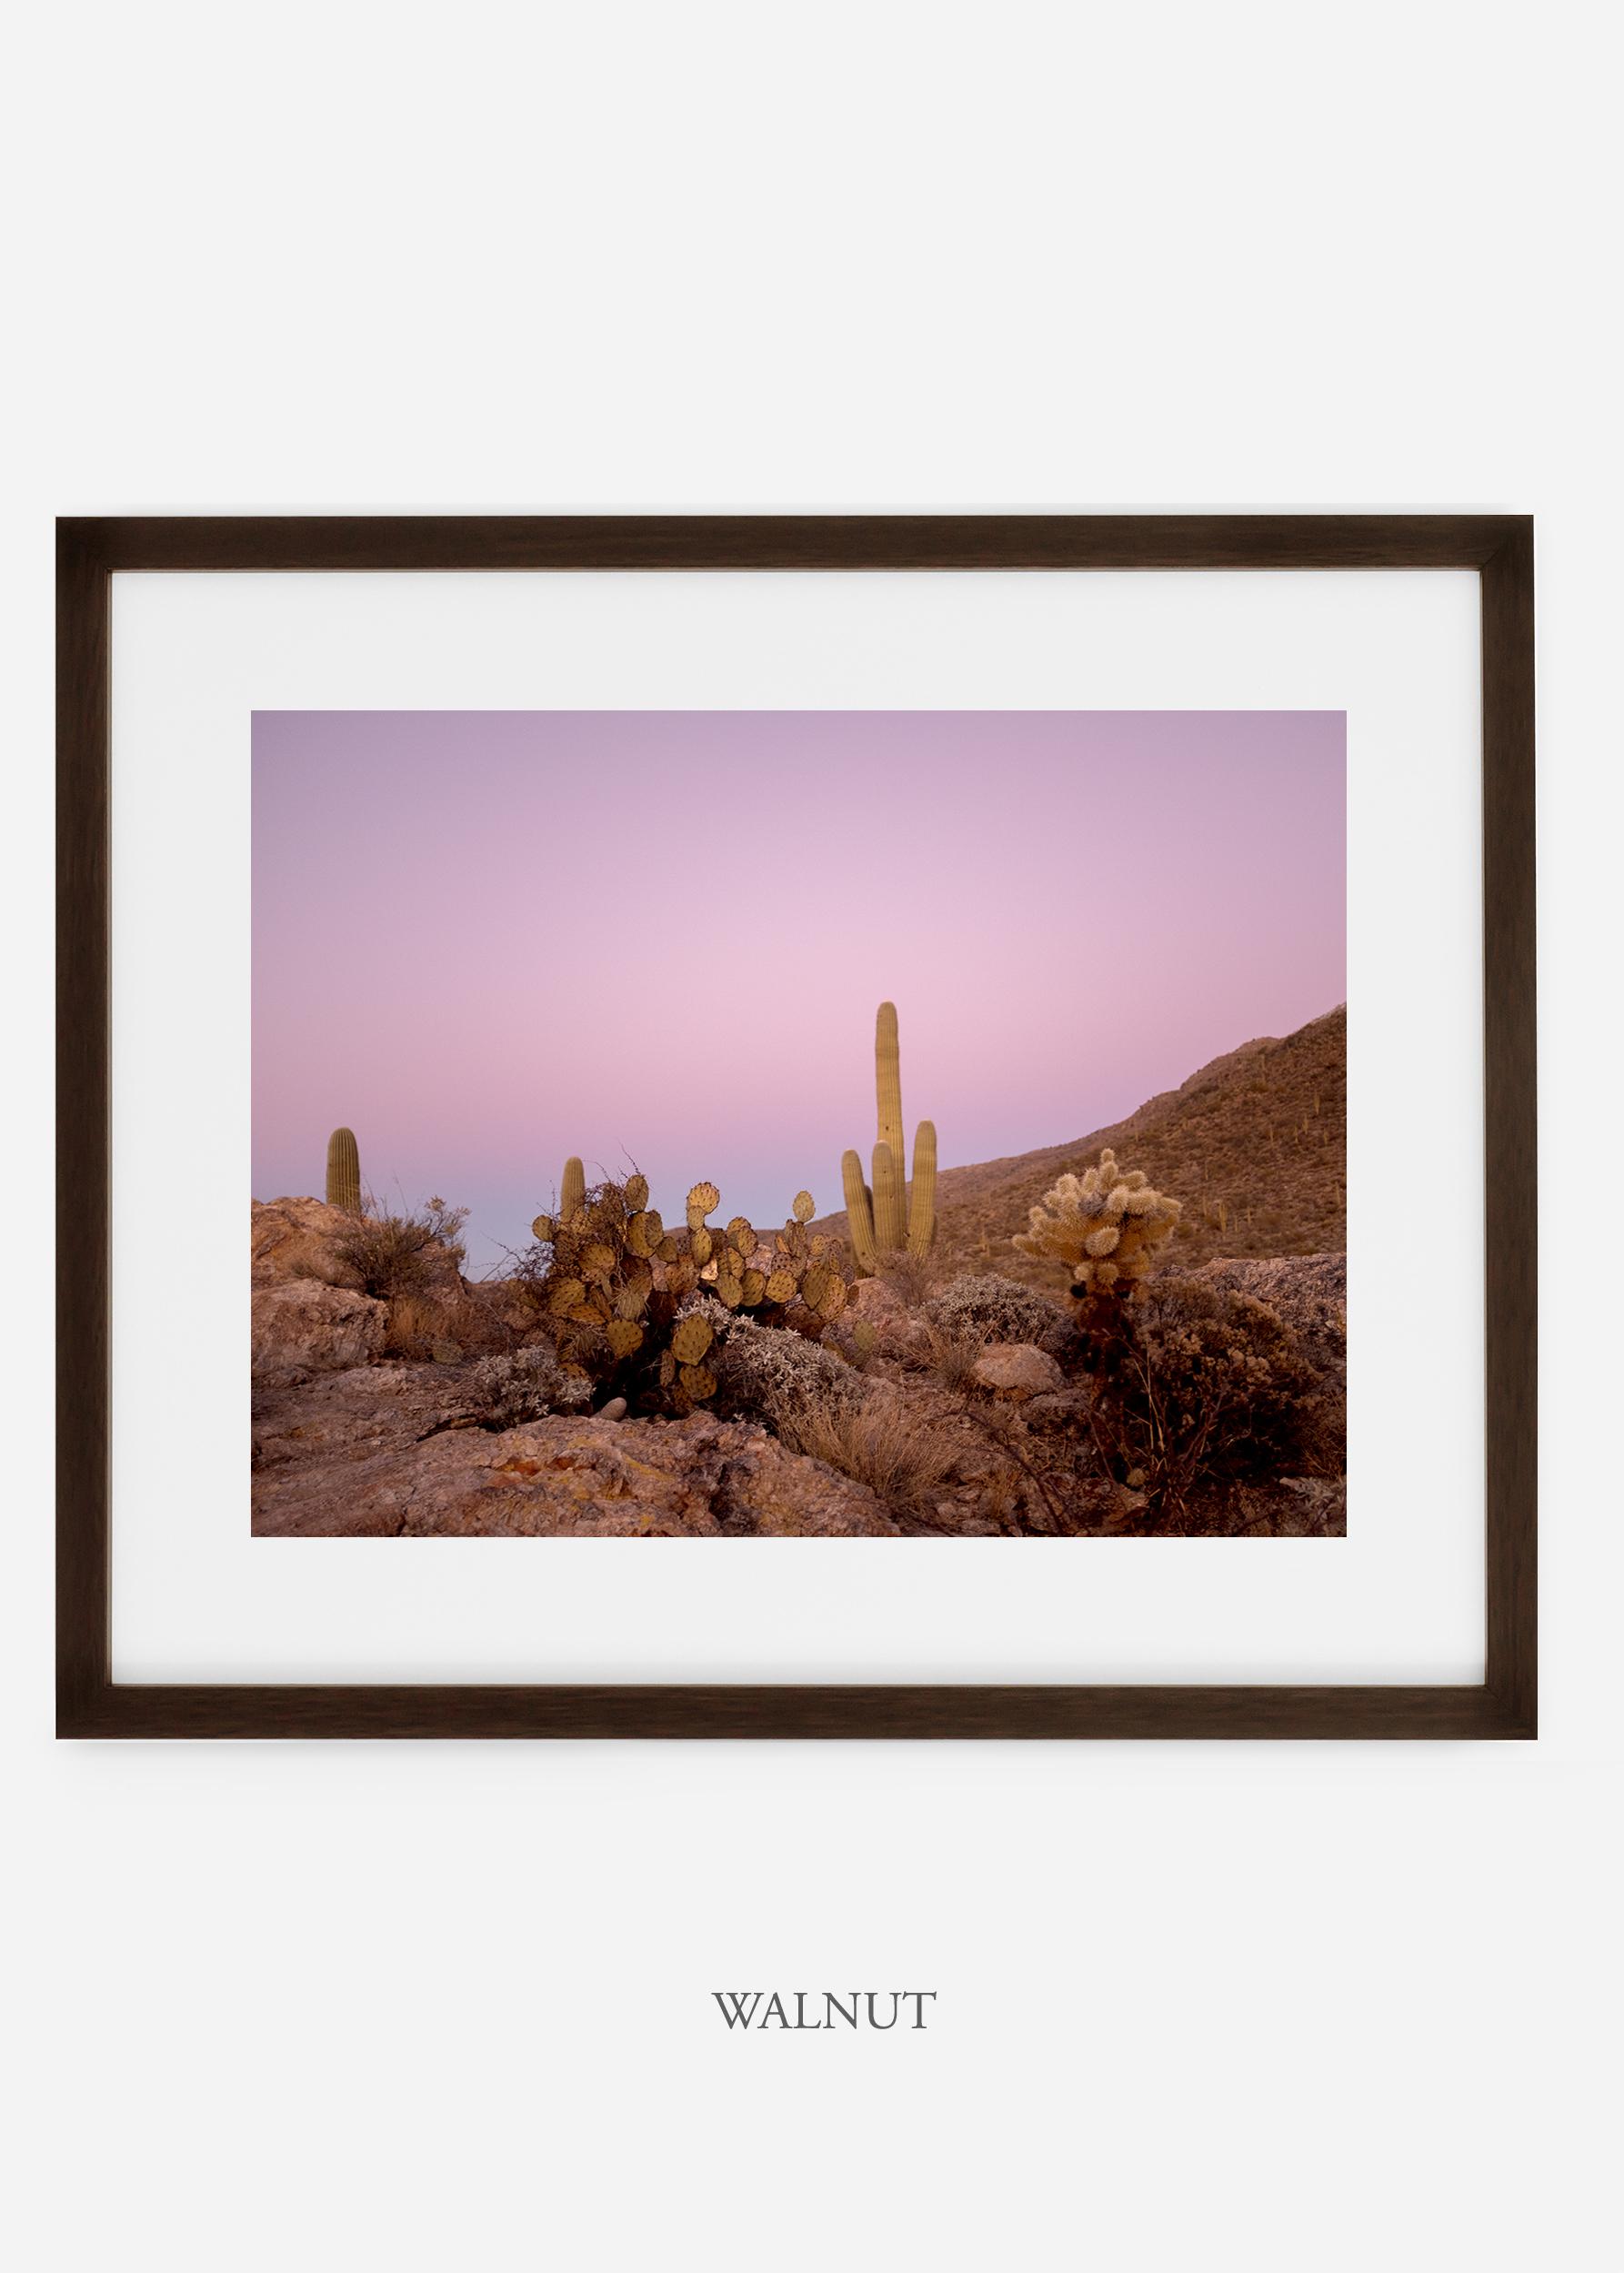 walnutframe-saguaroNo.9-wildercalifornia-art-wallart-cactusprint-homedecor-prints-arizona-botanical-artwork-interiordesign.jpg